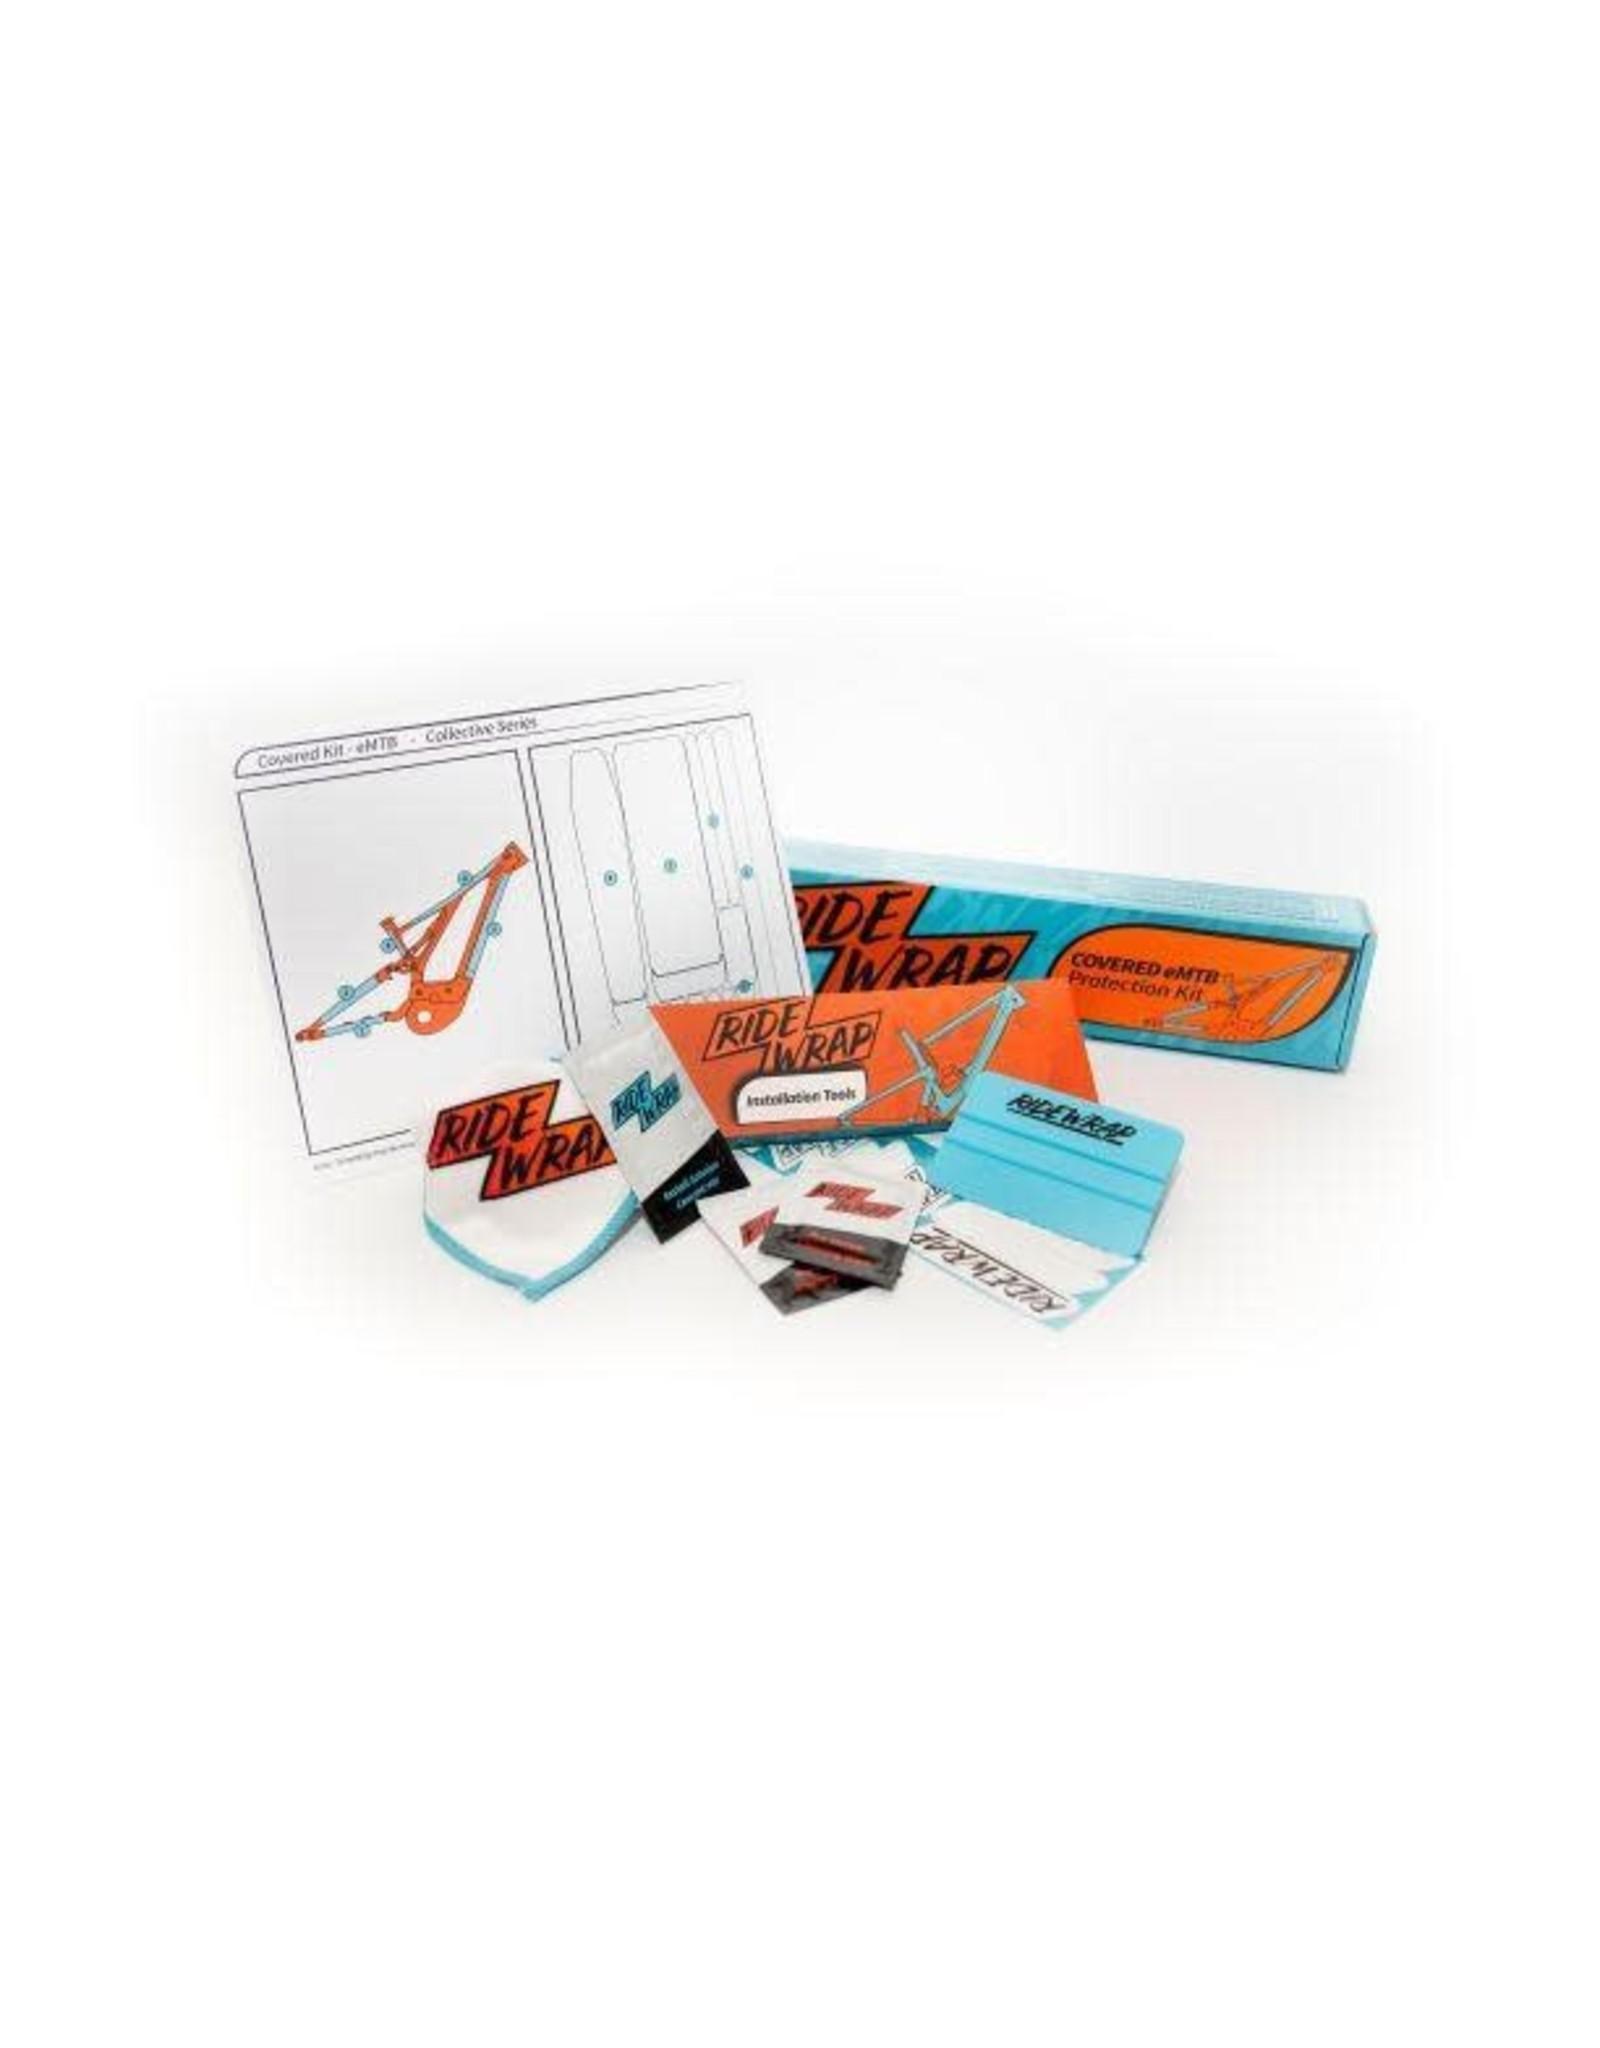 Ridewrap covered frame protection kit, MTB dual suspension, Matte